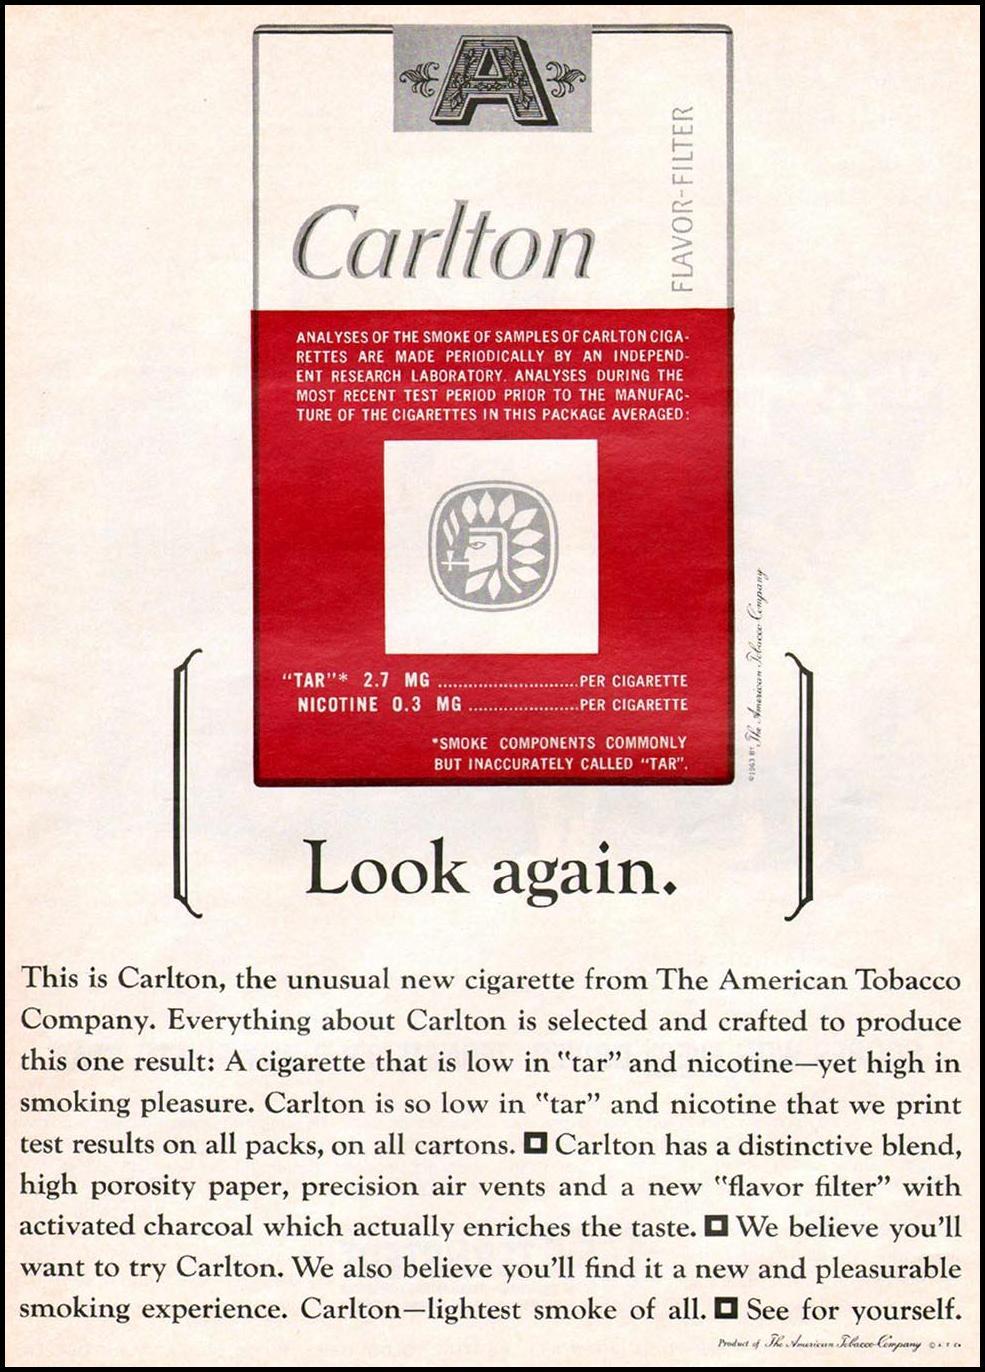 CARLTON CIGARETTES NEWSWEEK 10/12/1964